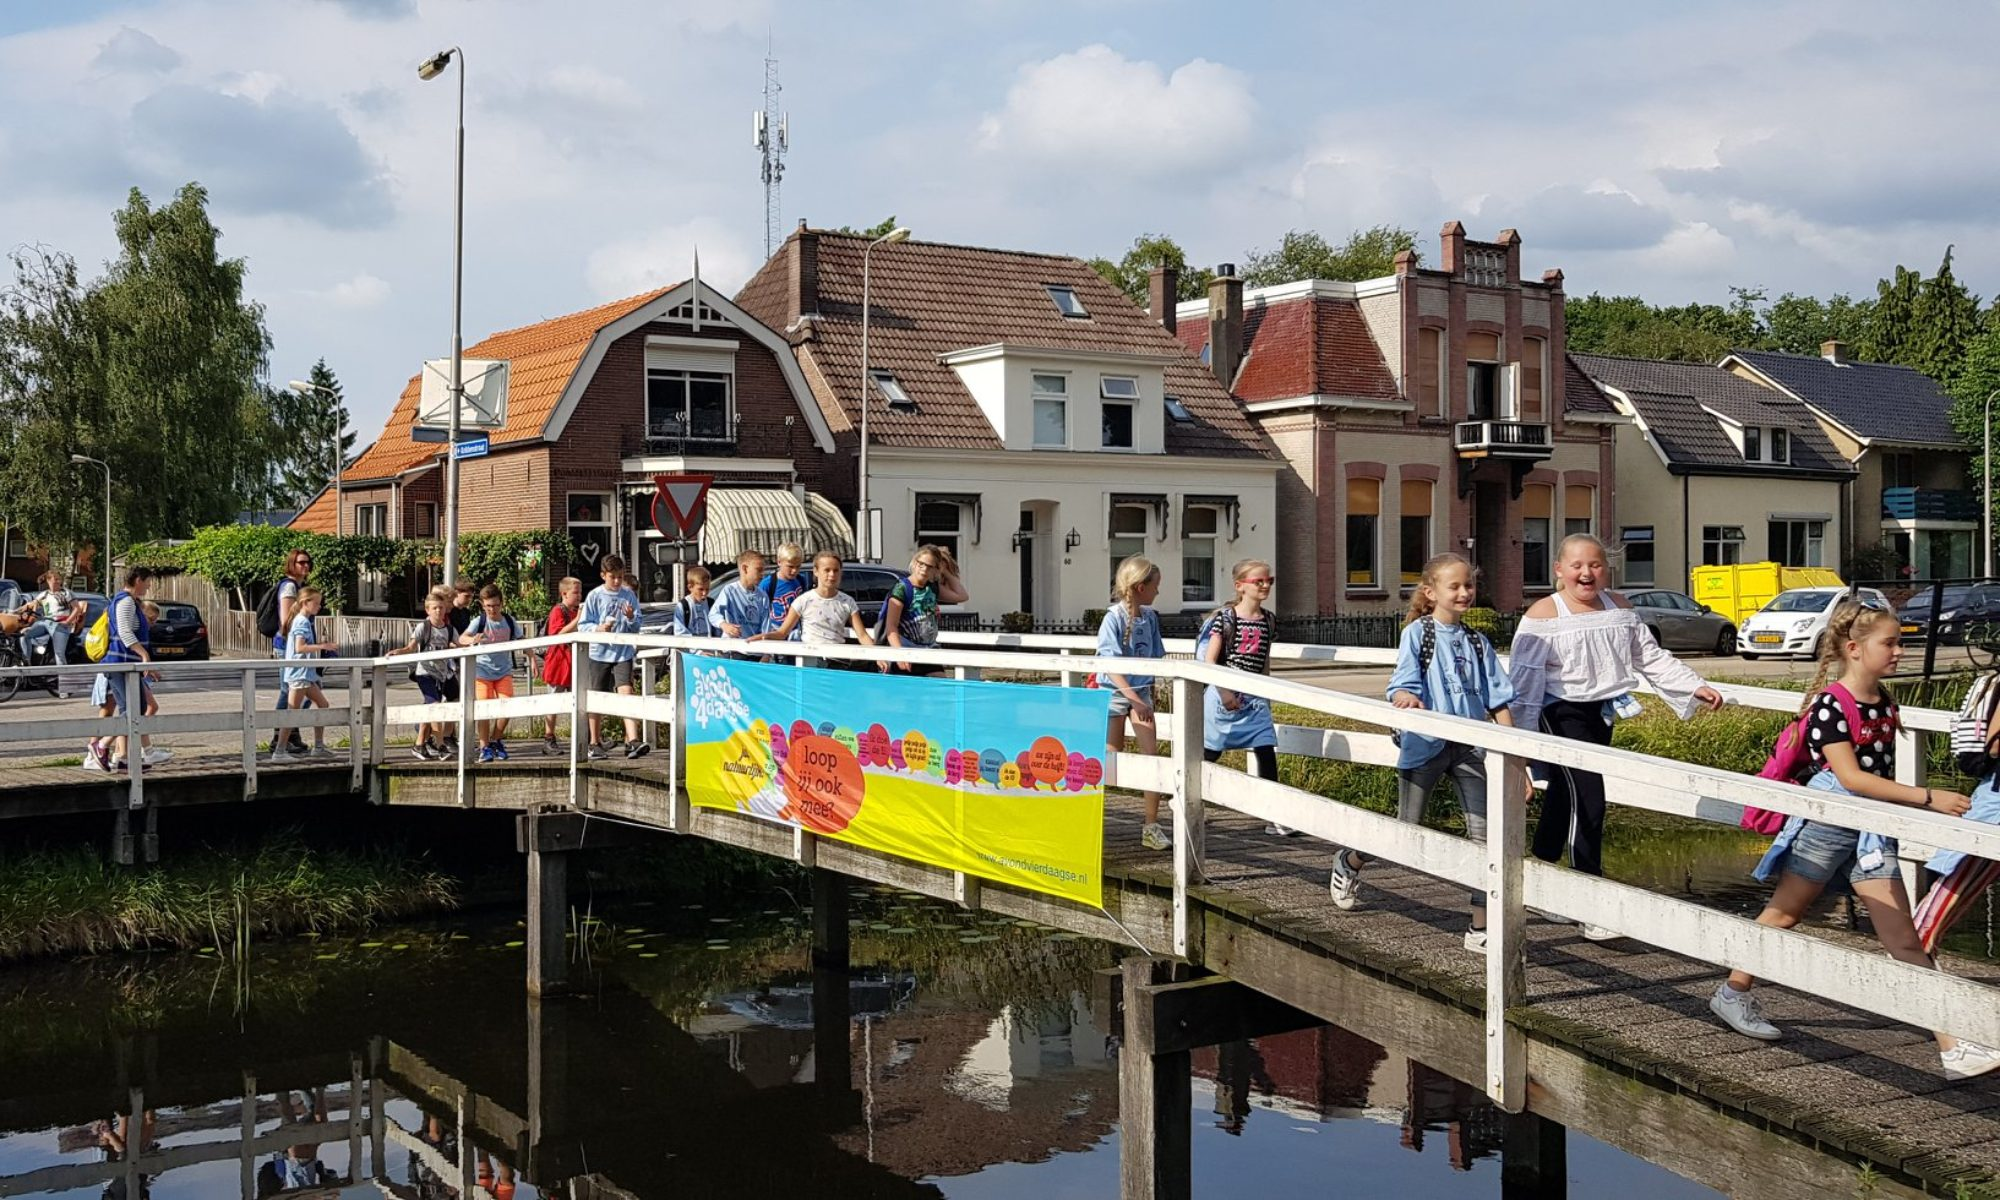 Stichting Dedemsvaart Loopt